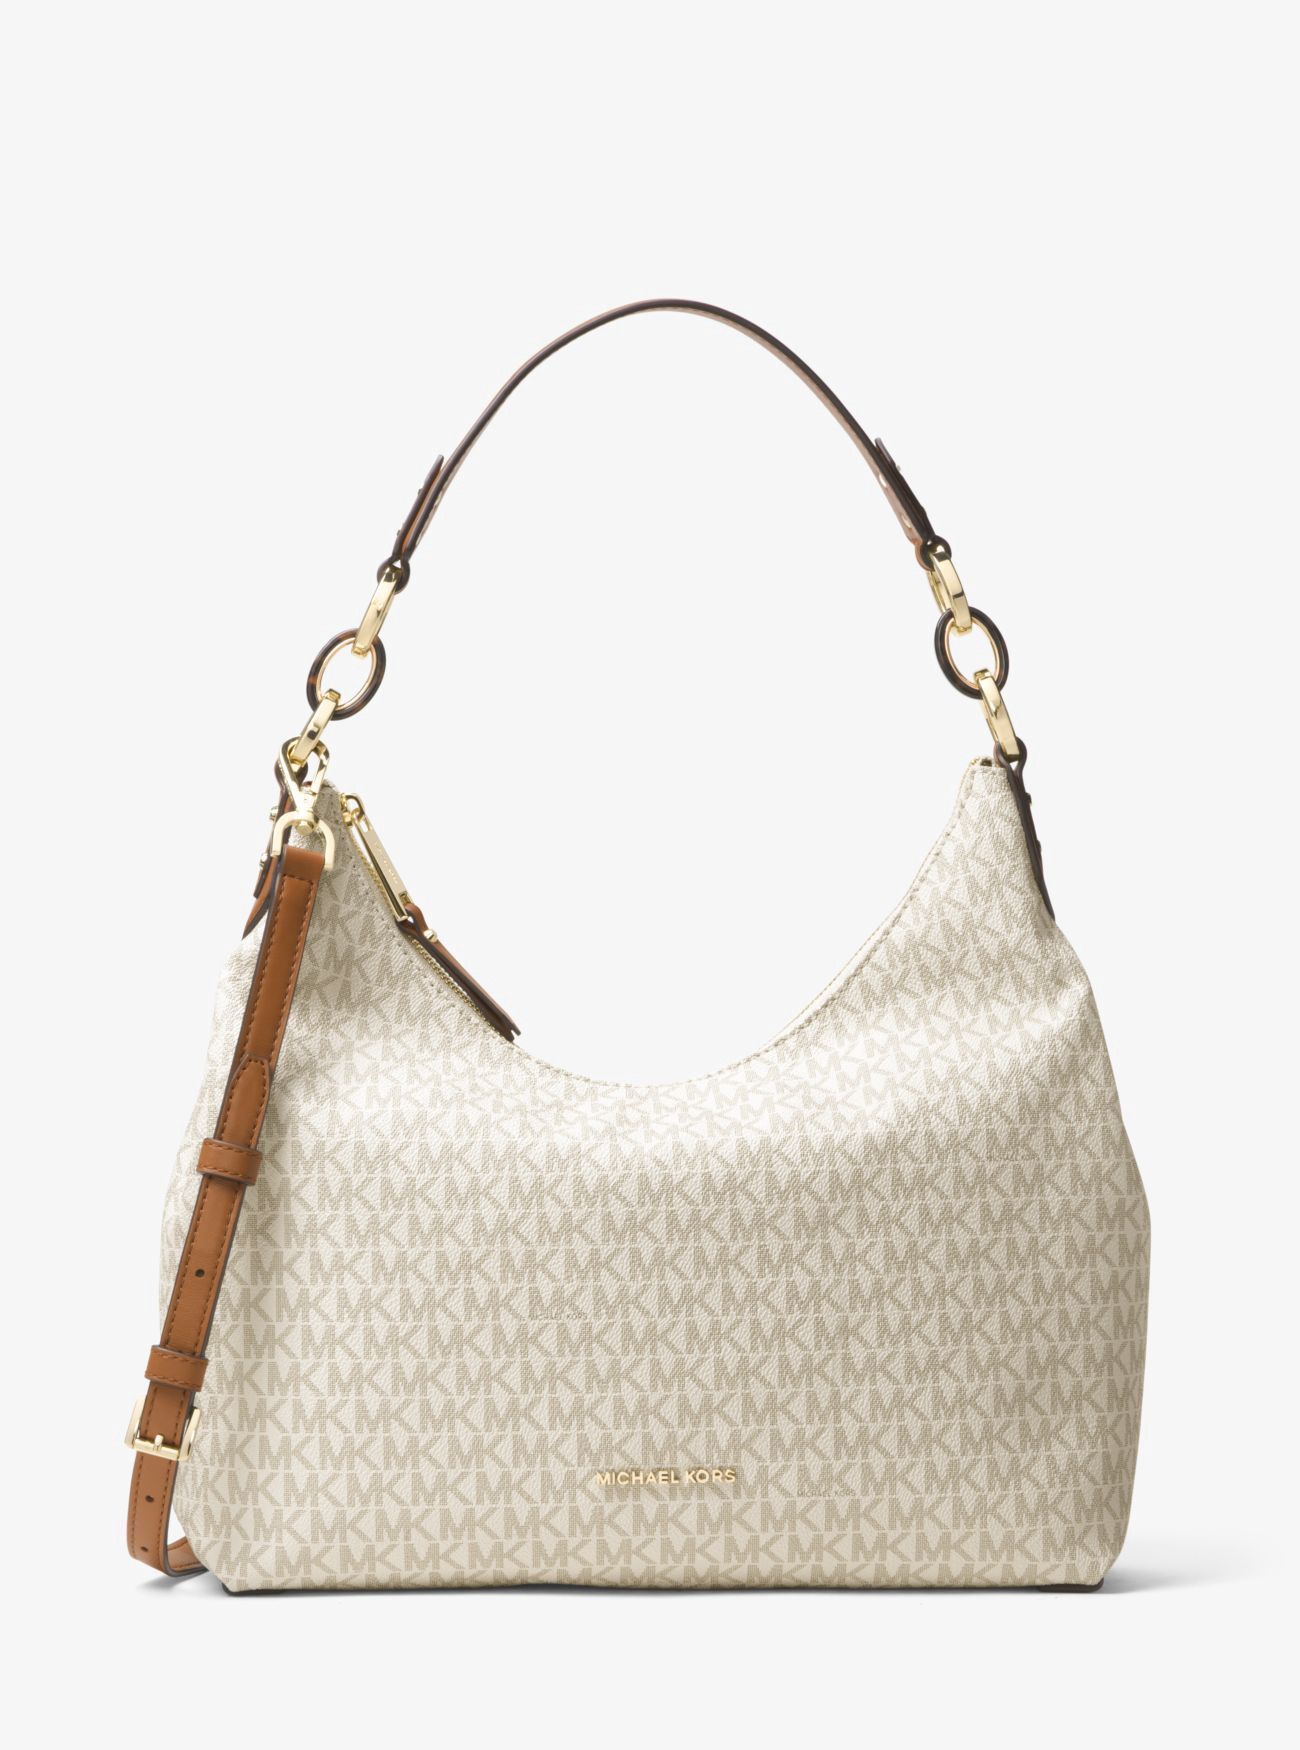 03df1b6c911e MICHAEL KORS Isabella Large Logo Shoulder Bag.  michaelkors  bags  shoulder  bags  hand bags  polyester  lining